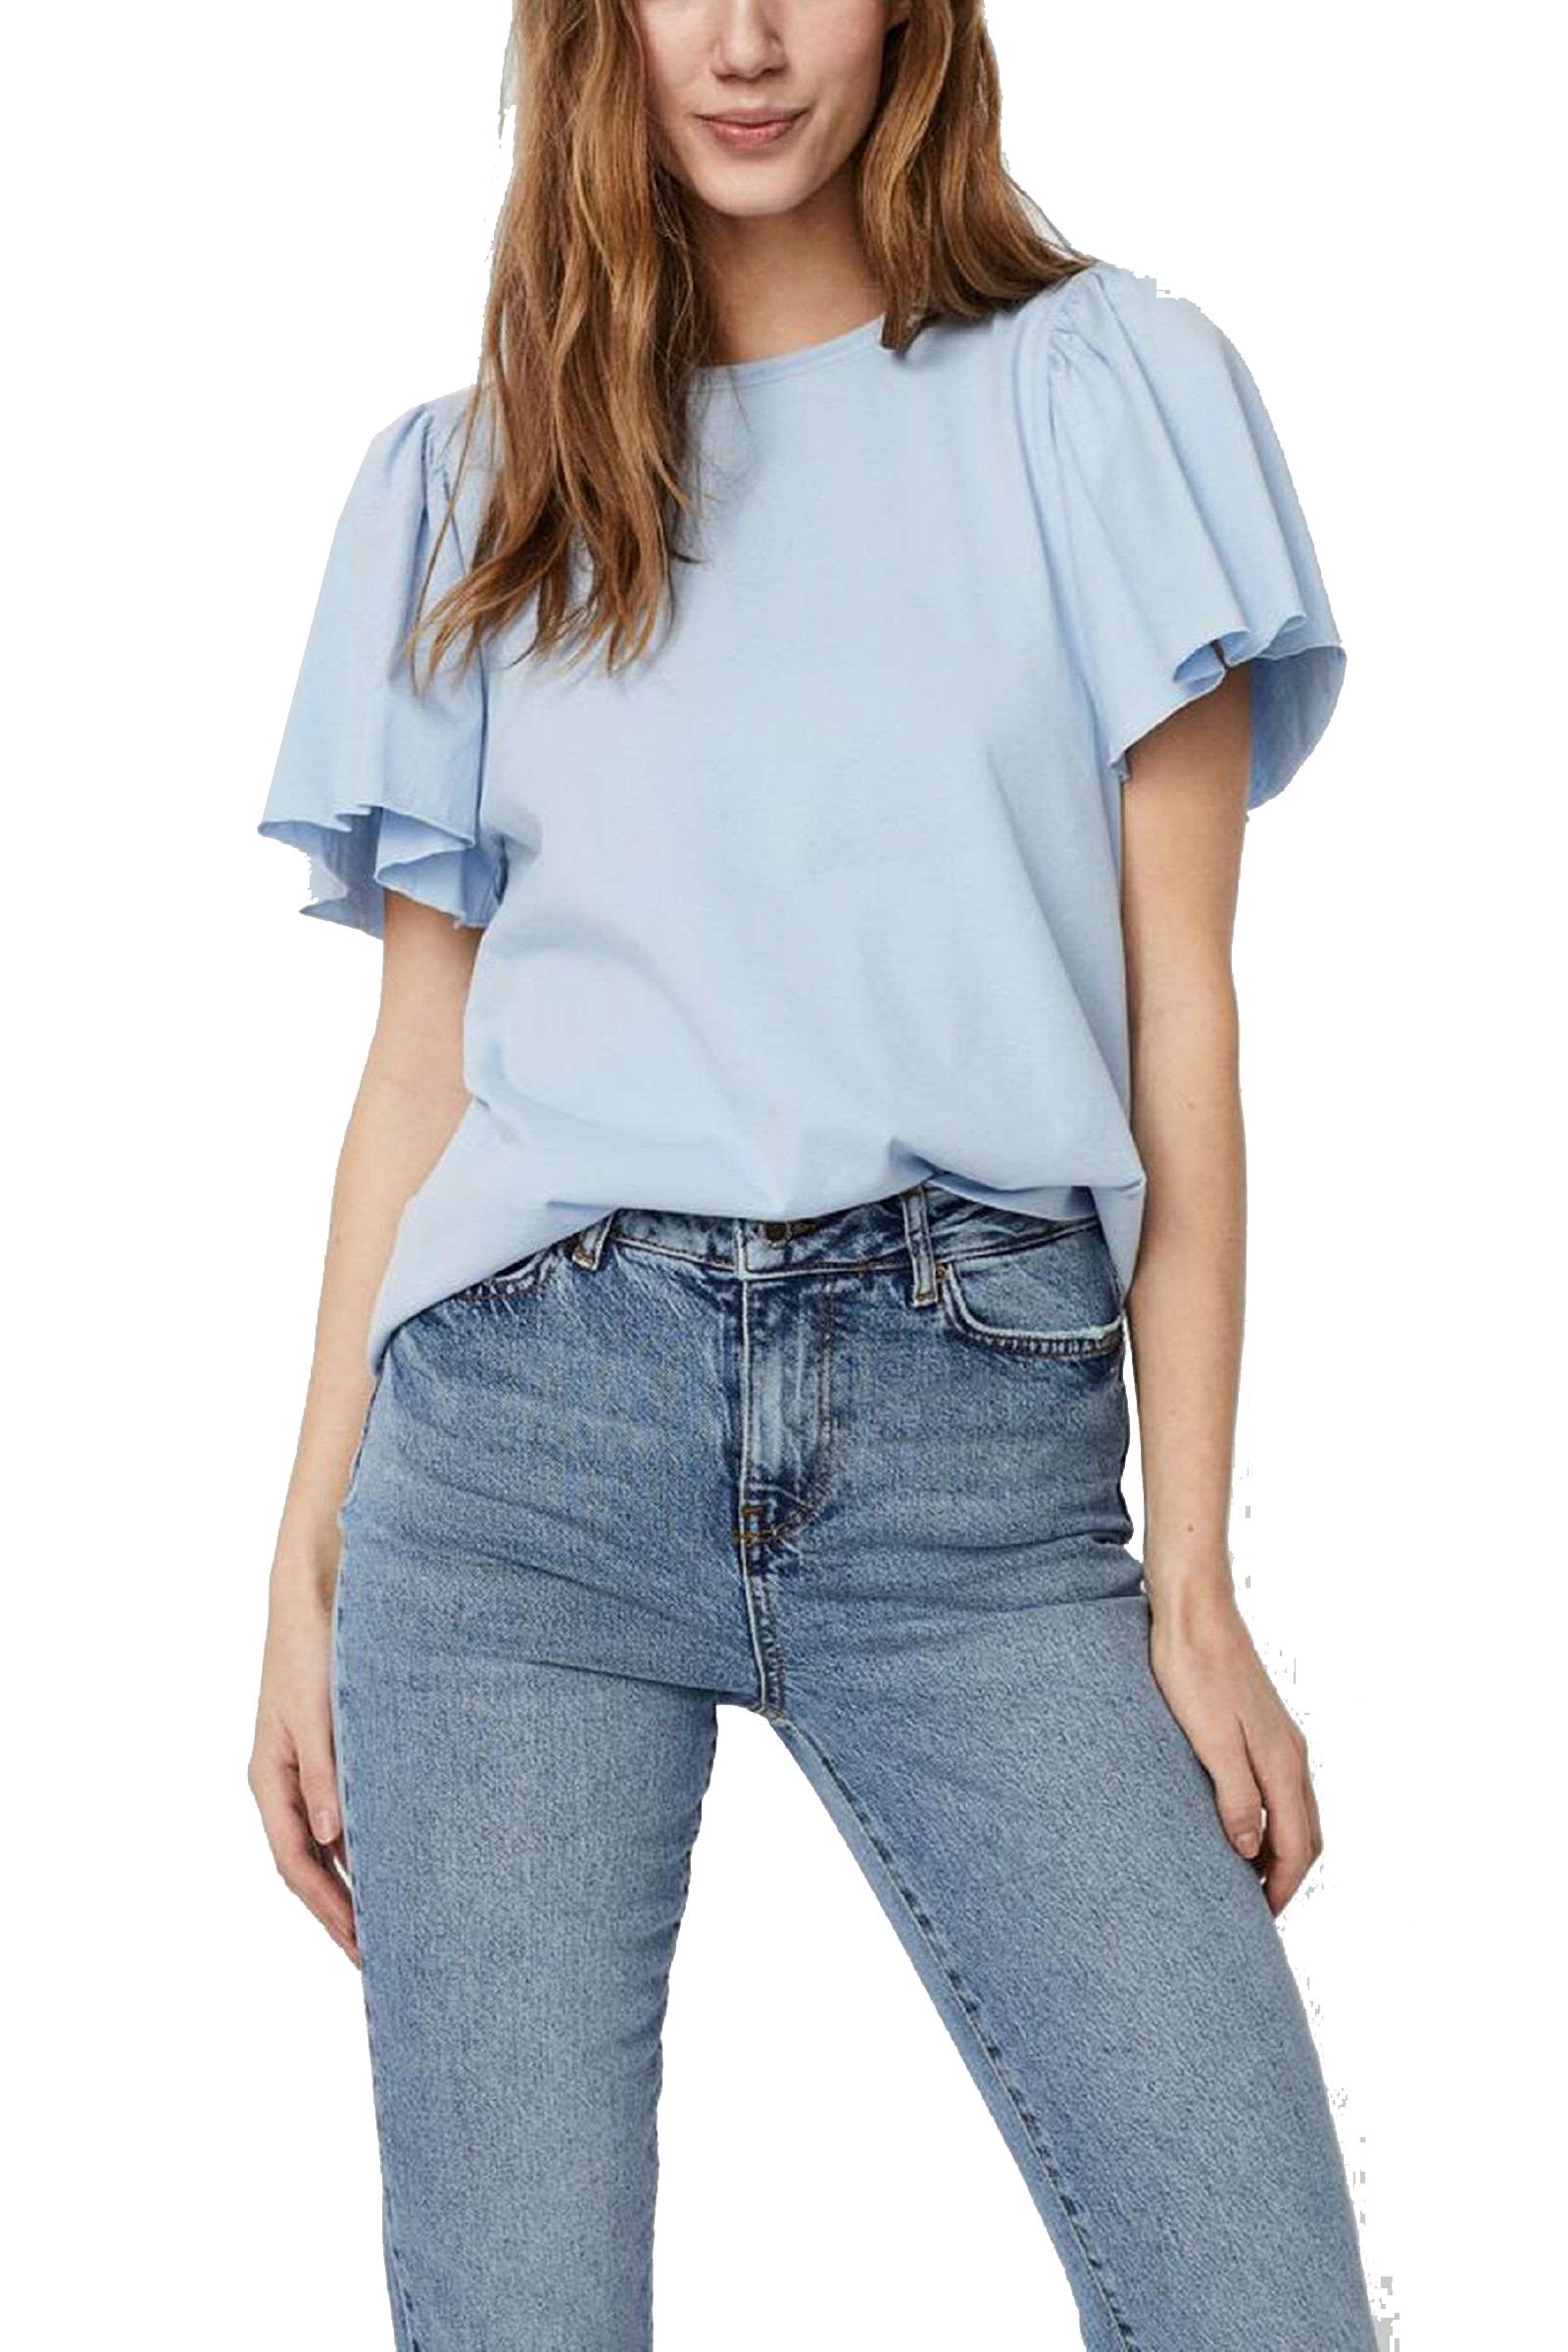 VERO MODA T-SHIRT Donna Modello ONELLA VERO MODA | T-Shirt | 10244714Cashmere Blue